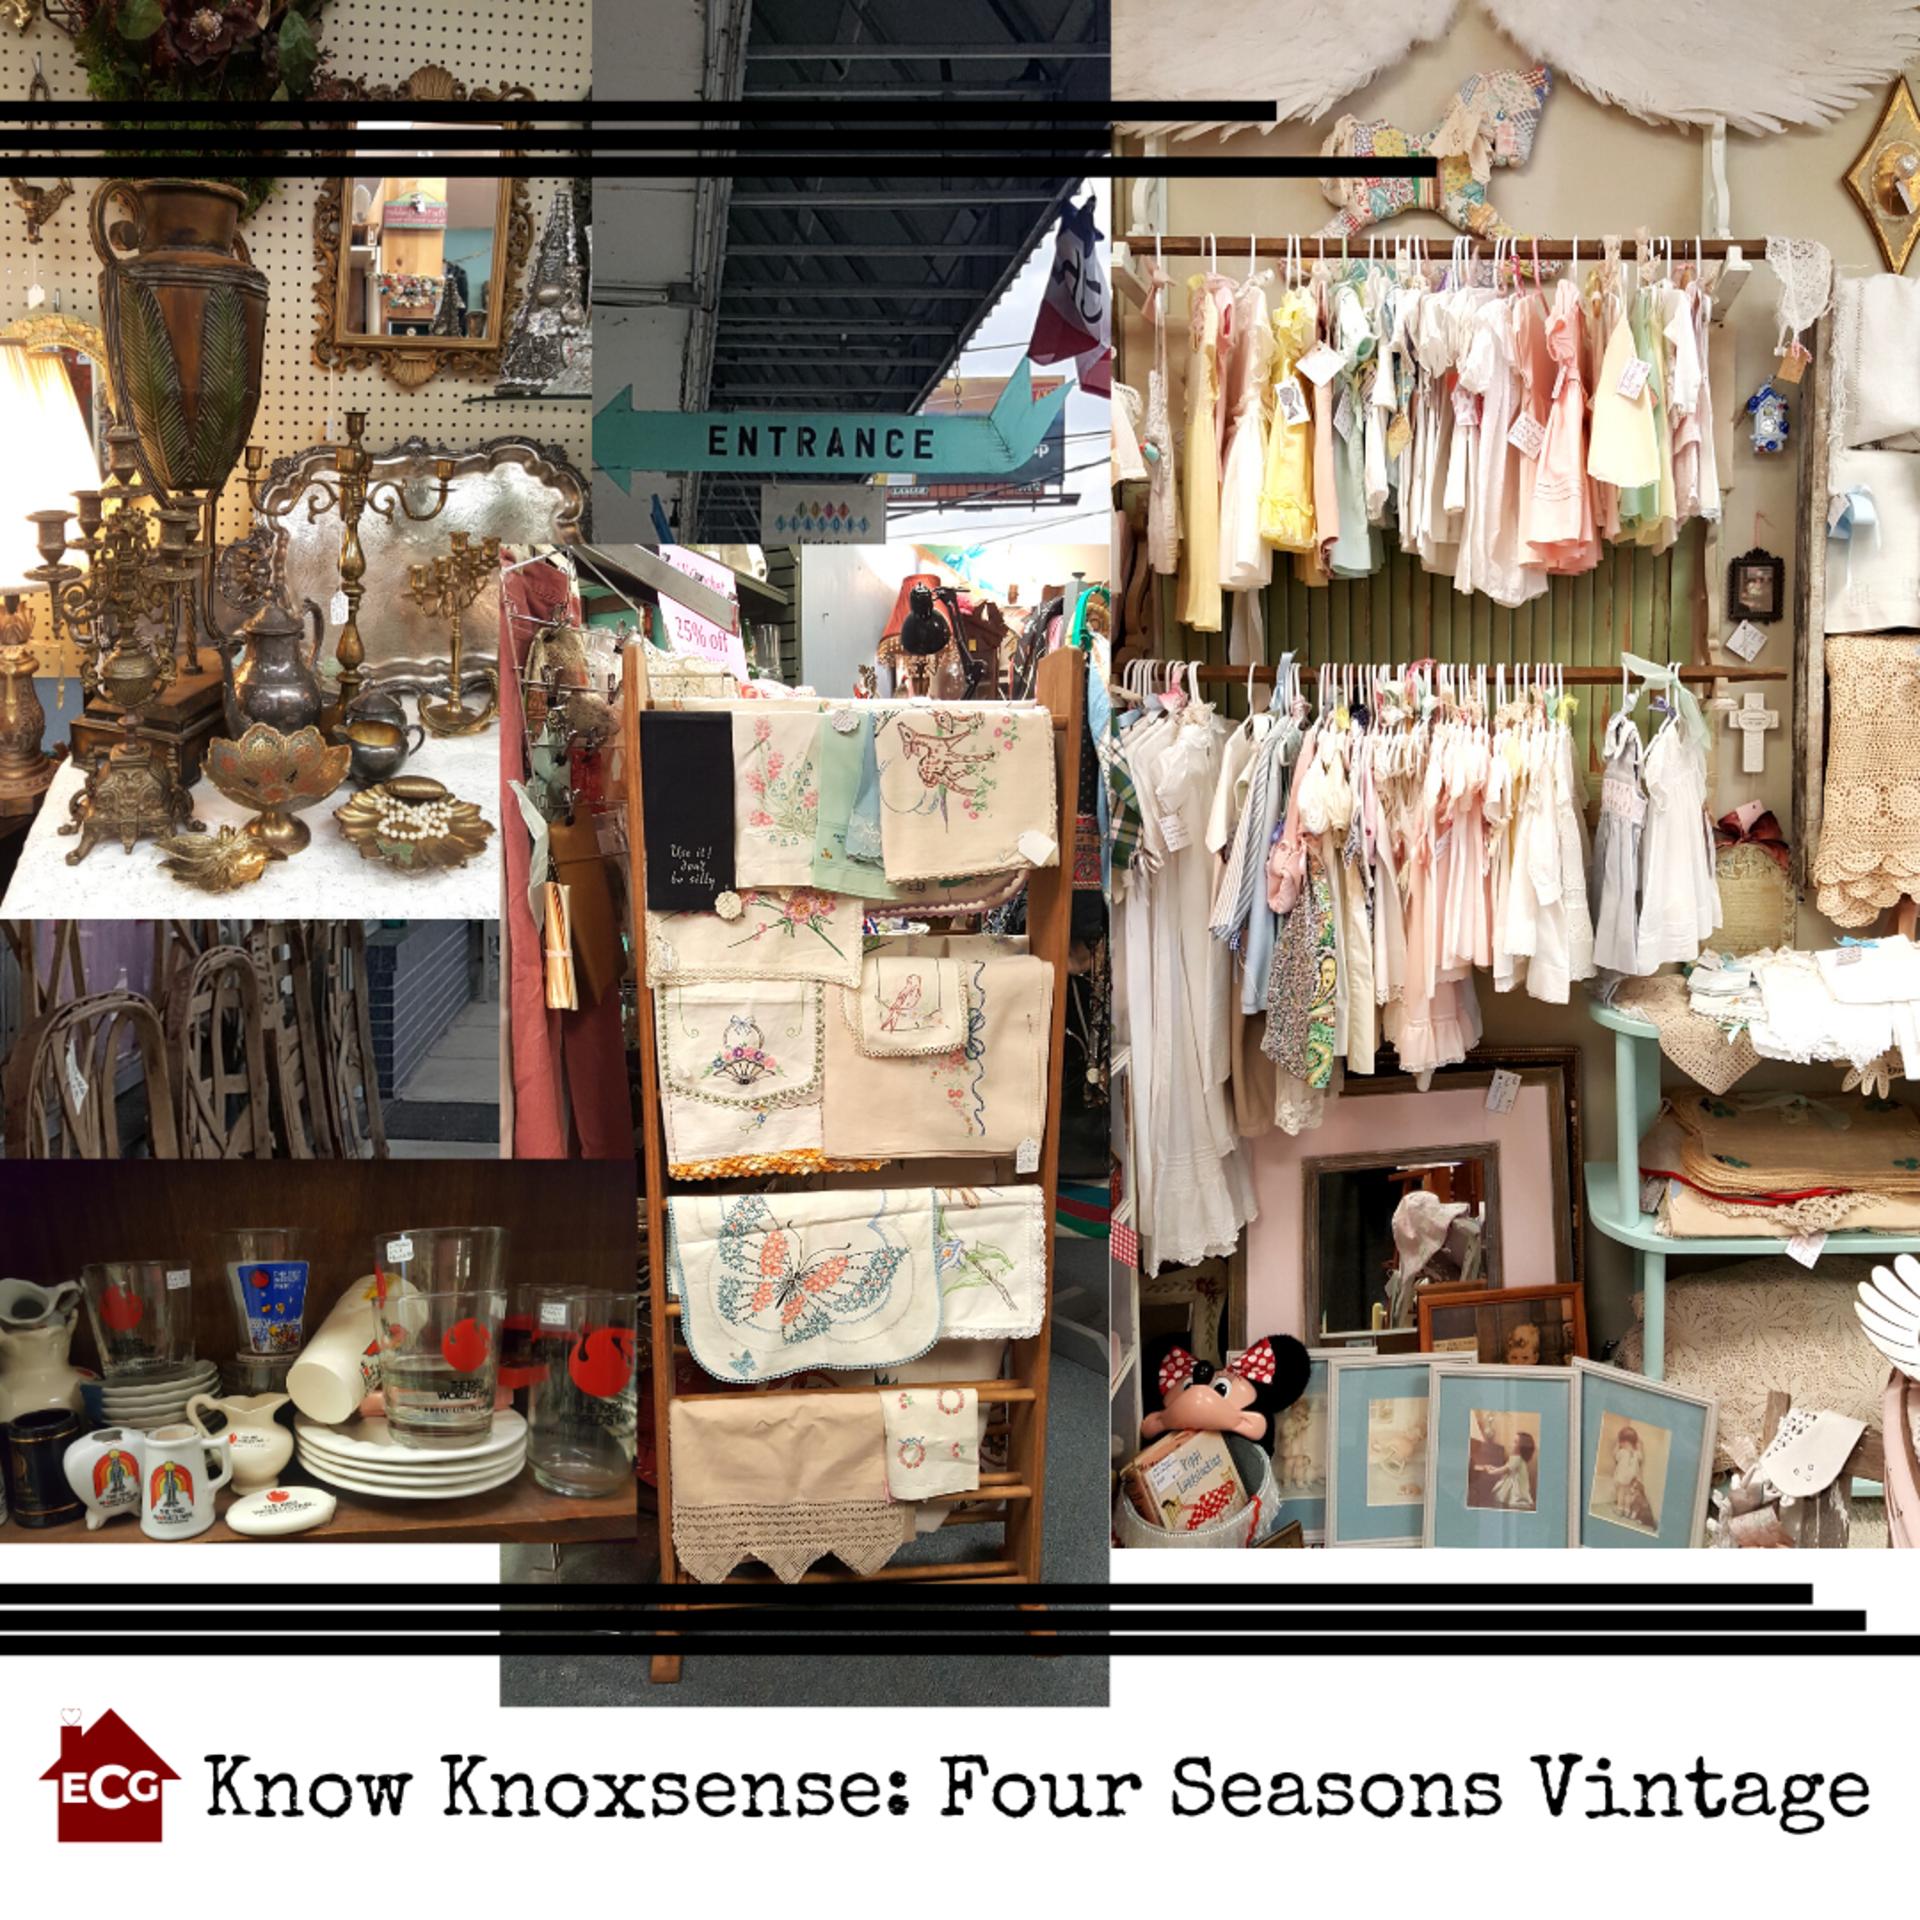 Know Knoxsense: Four Seasons Vintage